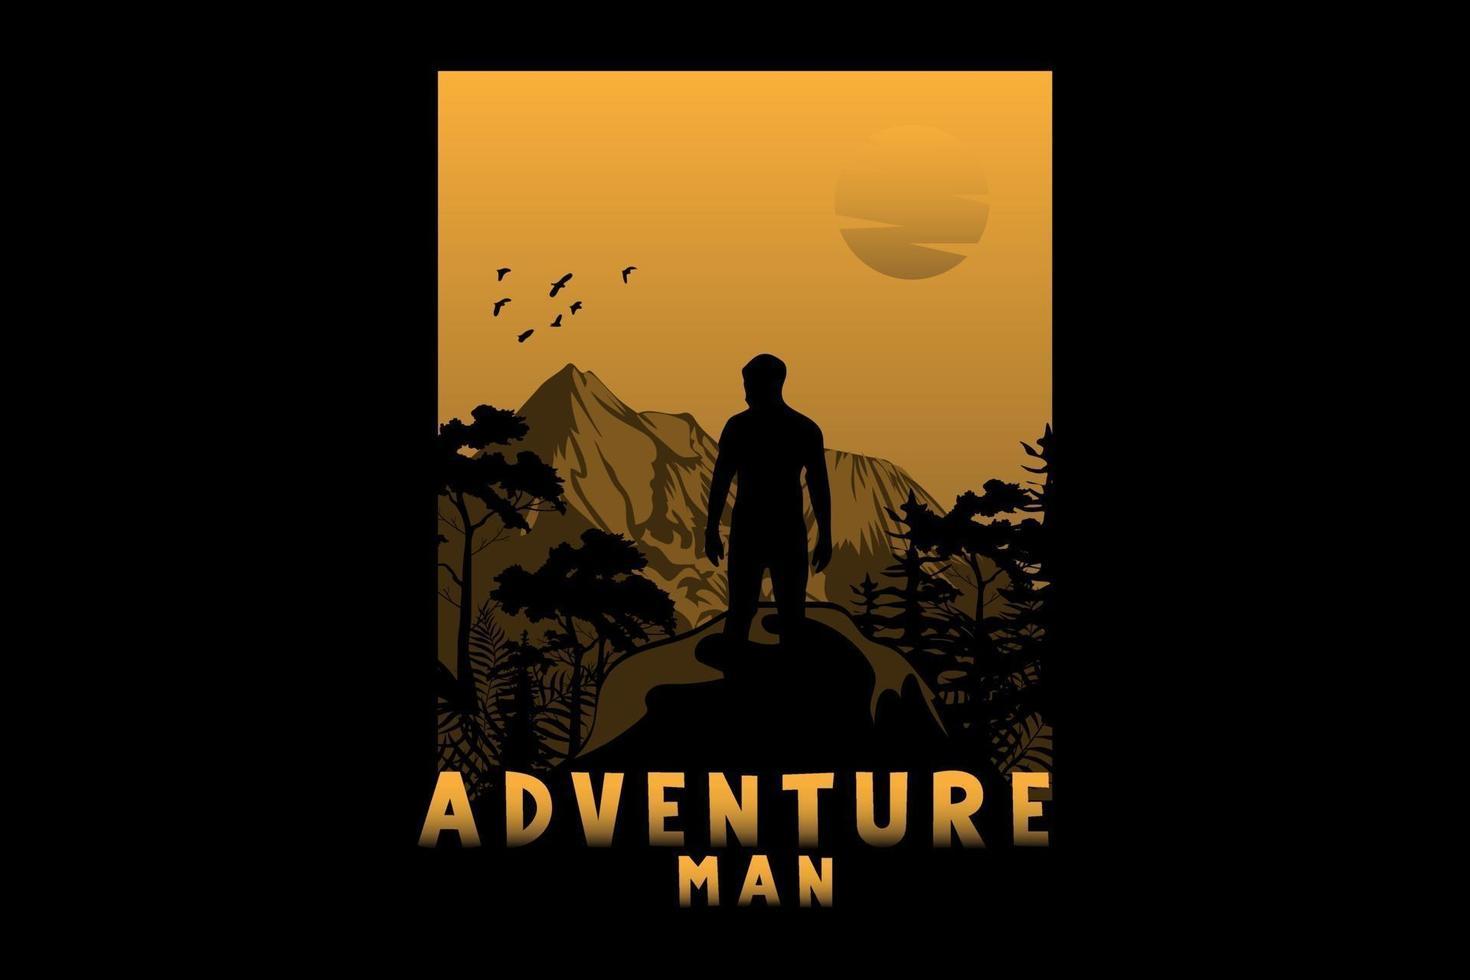 aventura homem silhueta design vetor